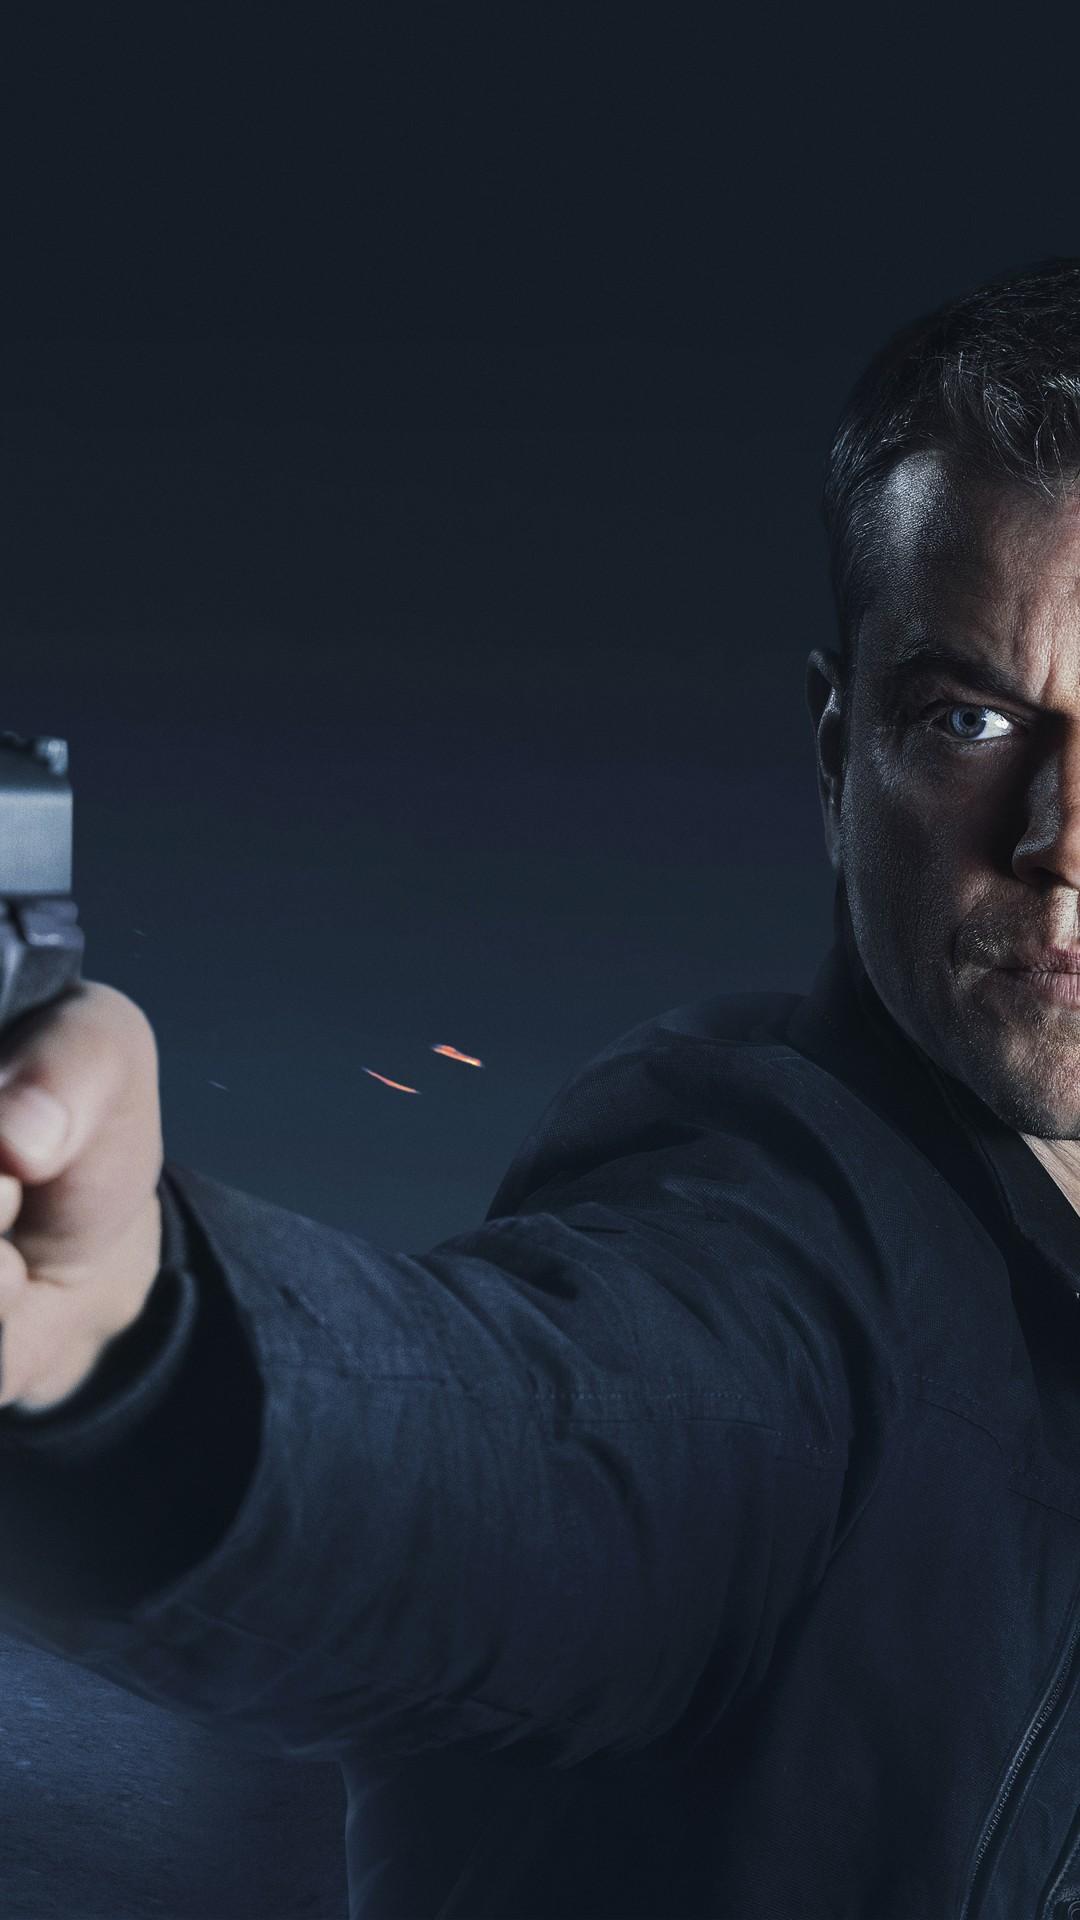 Res: 1080x1920, Jason Bourne Wallpaper